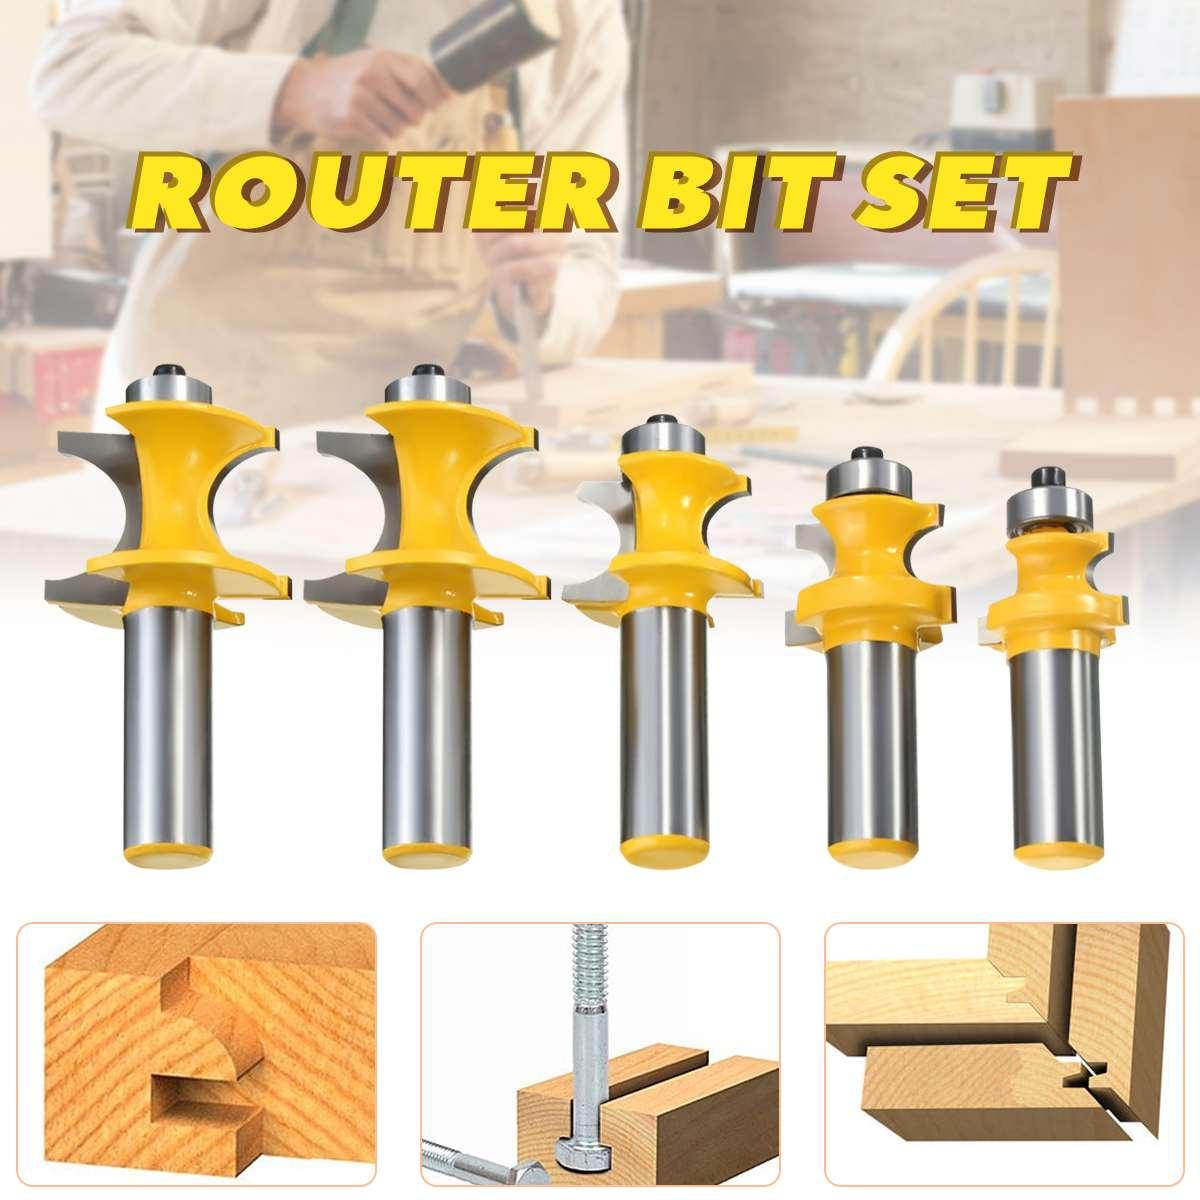 5Pcs Bullnose Bead Column Face Molding Router Bit 1/2 Shank Woodworking Milling Cutter5Pcs Bullnose Bead Column Face Molding Router Bit 1/2 Shank Woodworking Milling Cutter